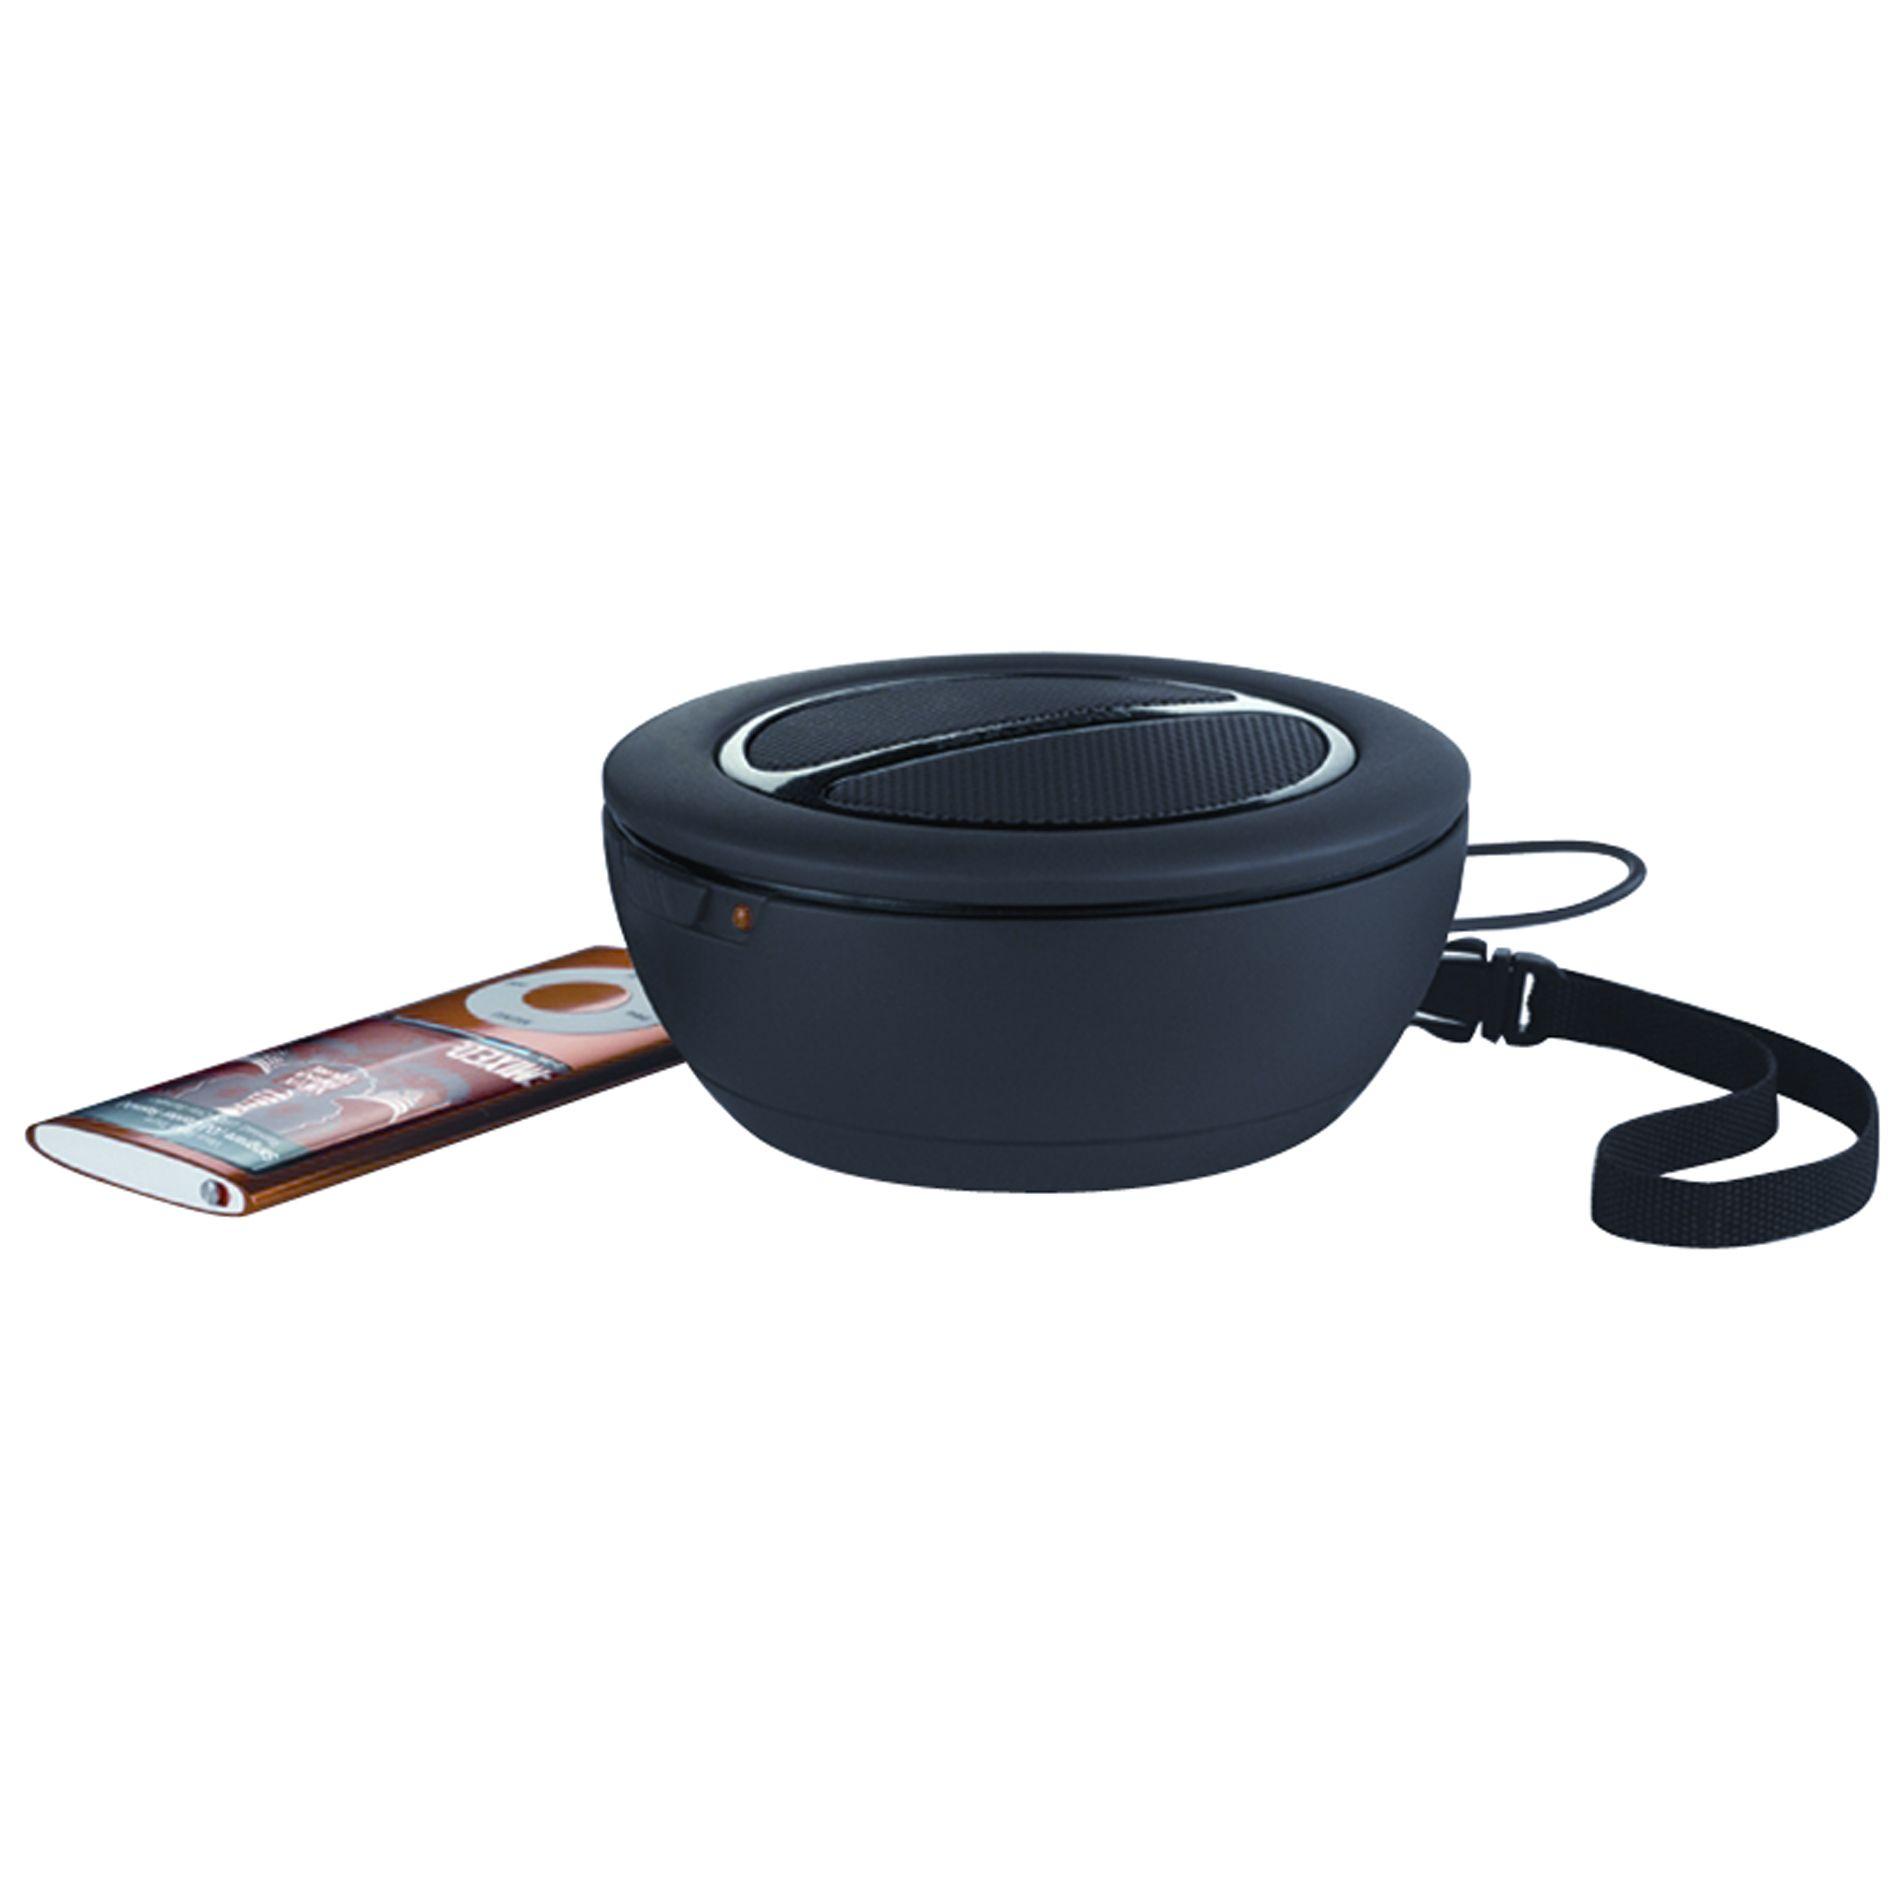 Memorex Portable Speaker